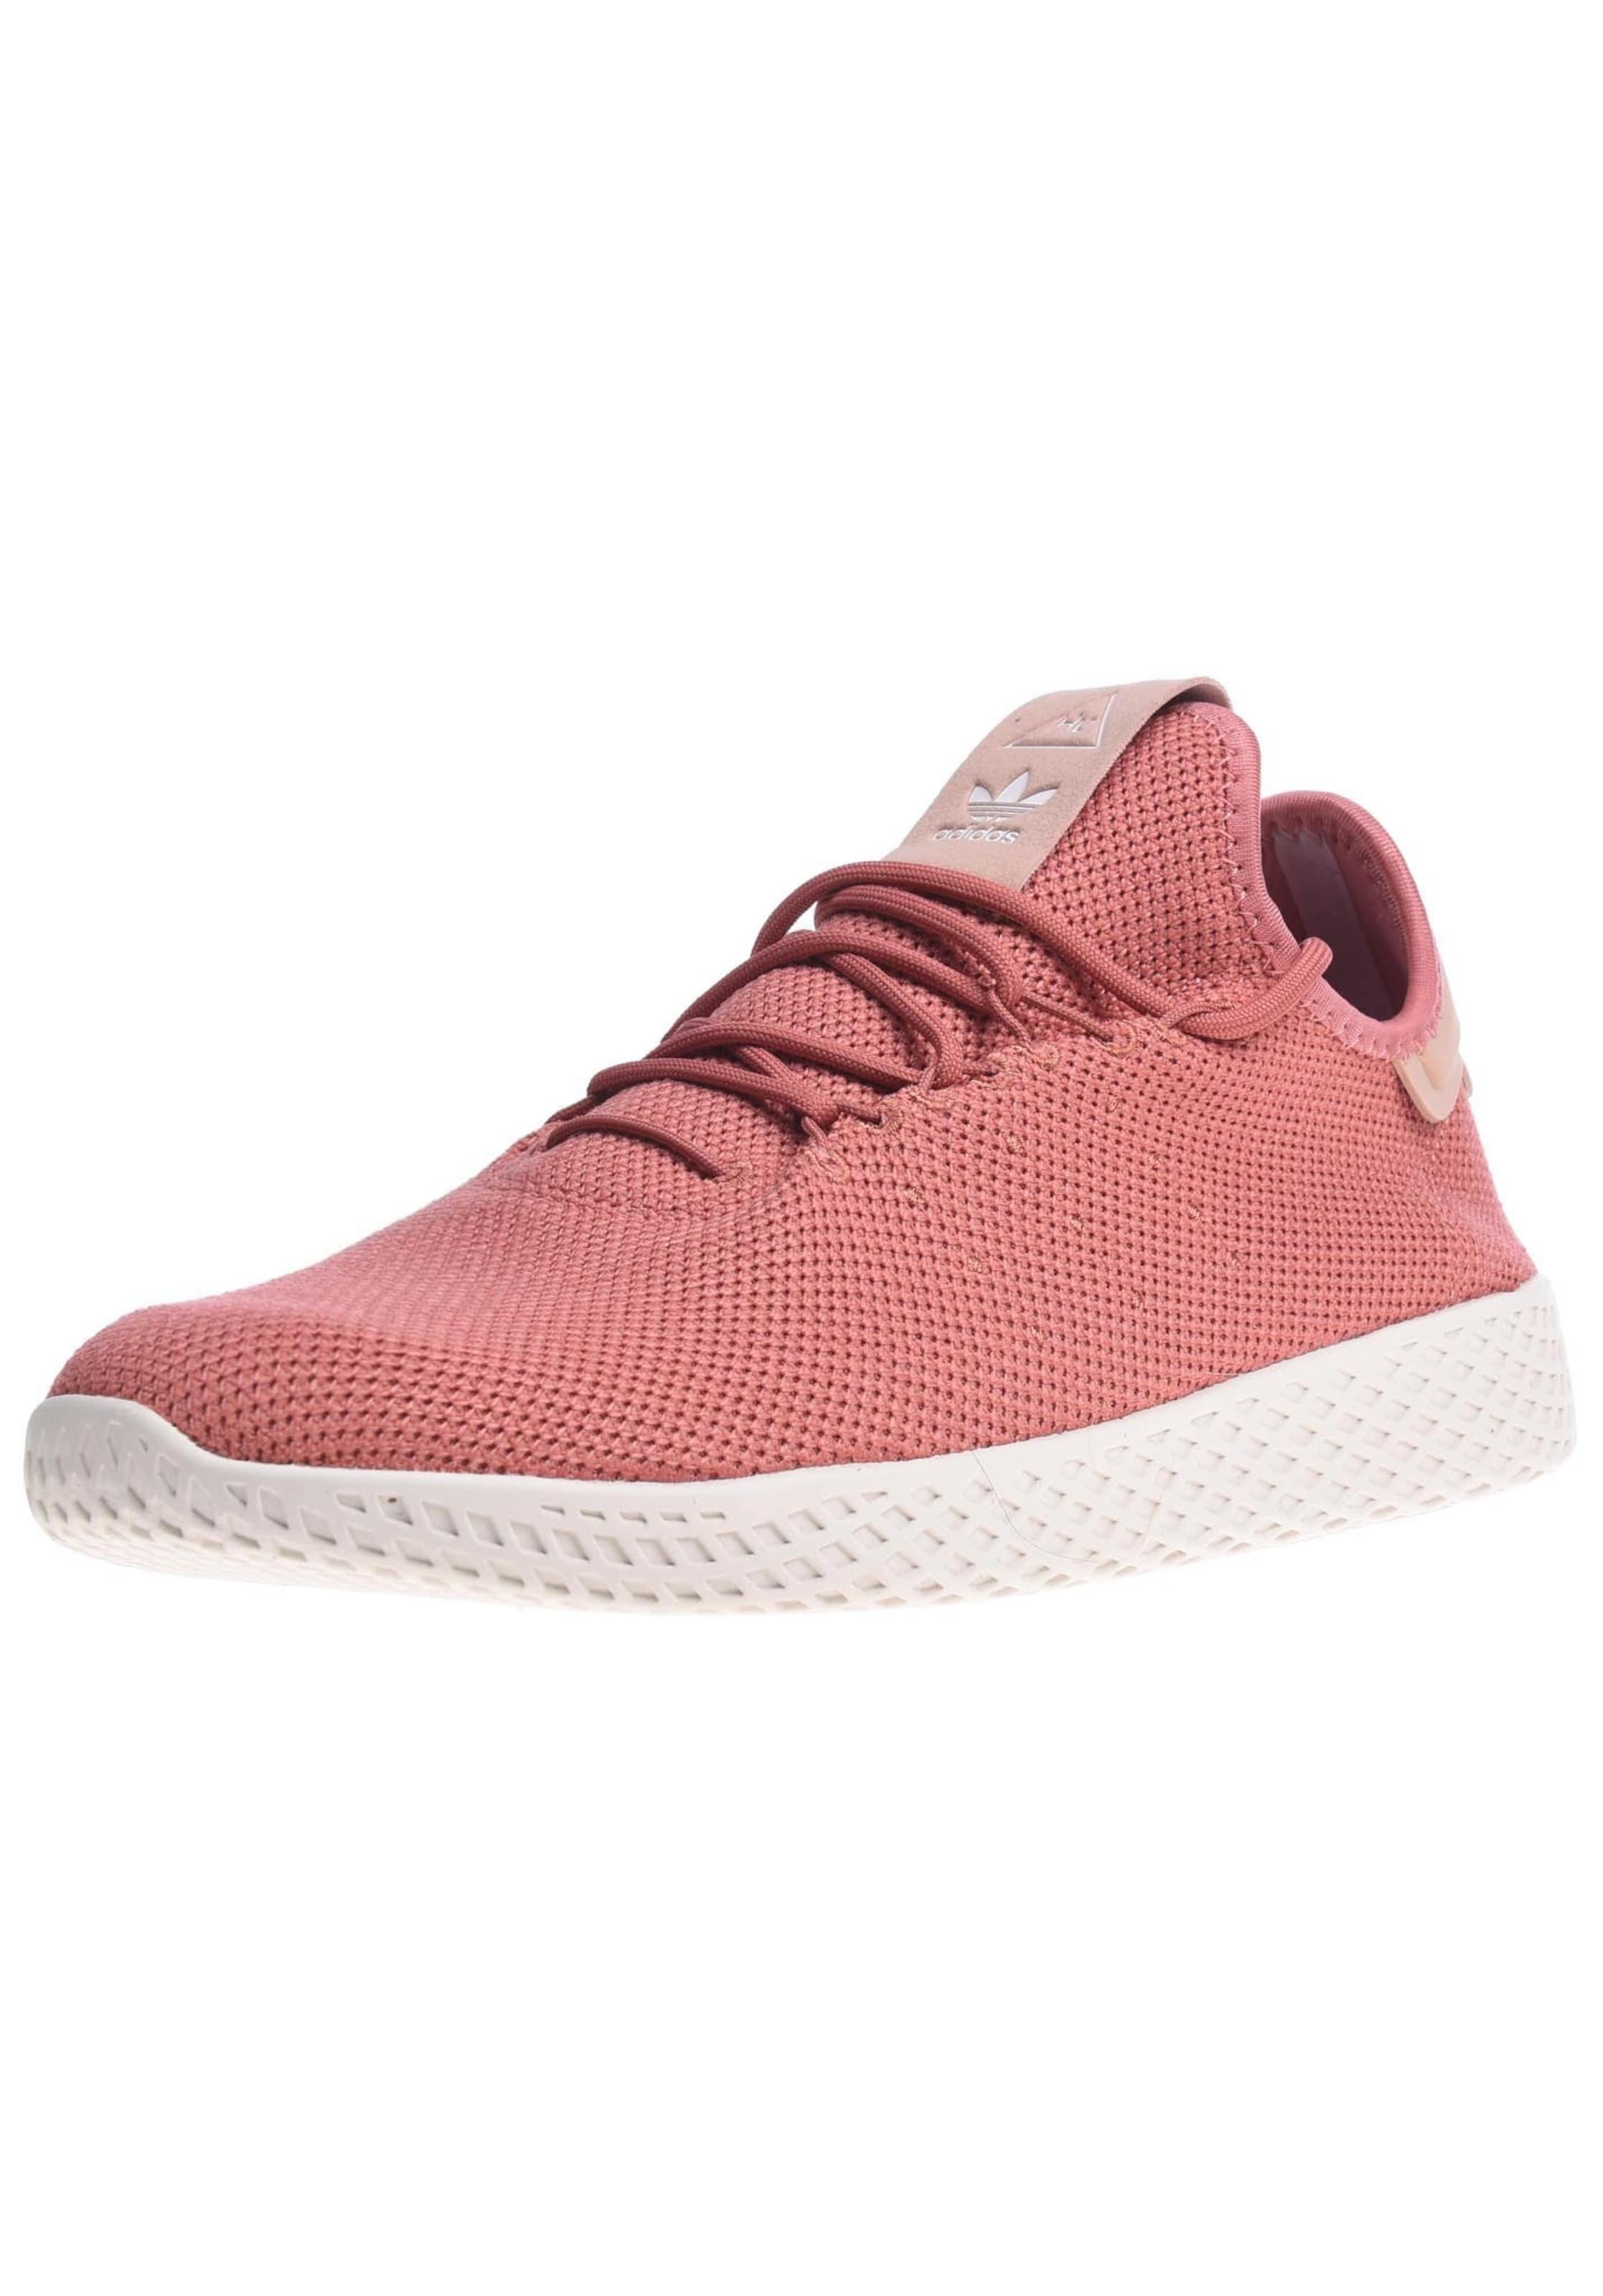 ADIDAS ORIGINALS Sneaker  Pharrell Williams Tennis Hu